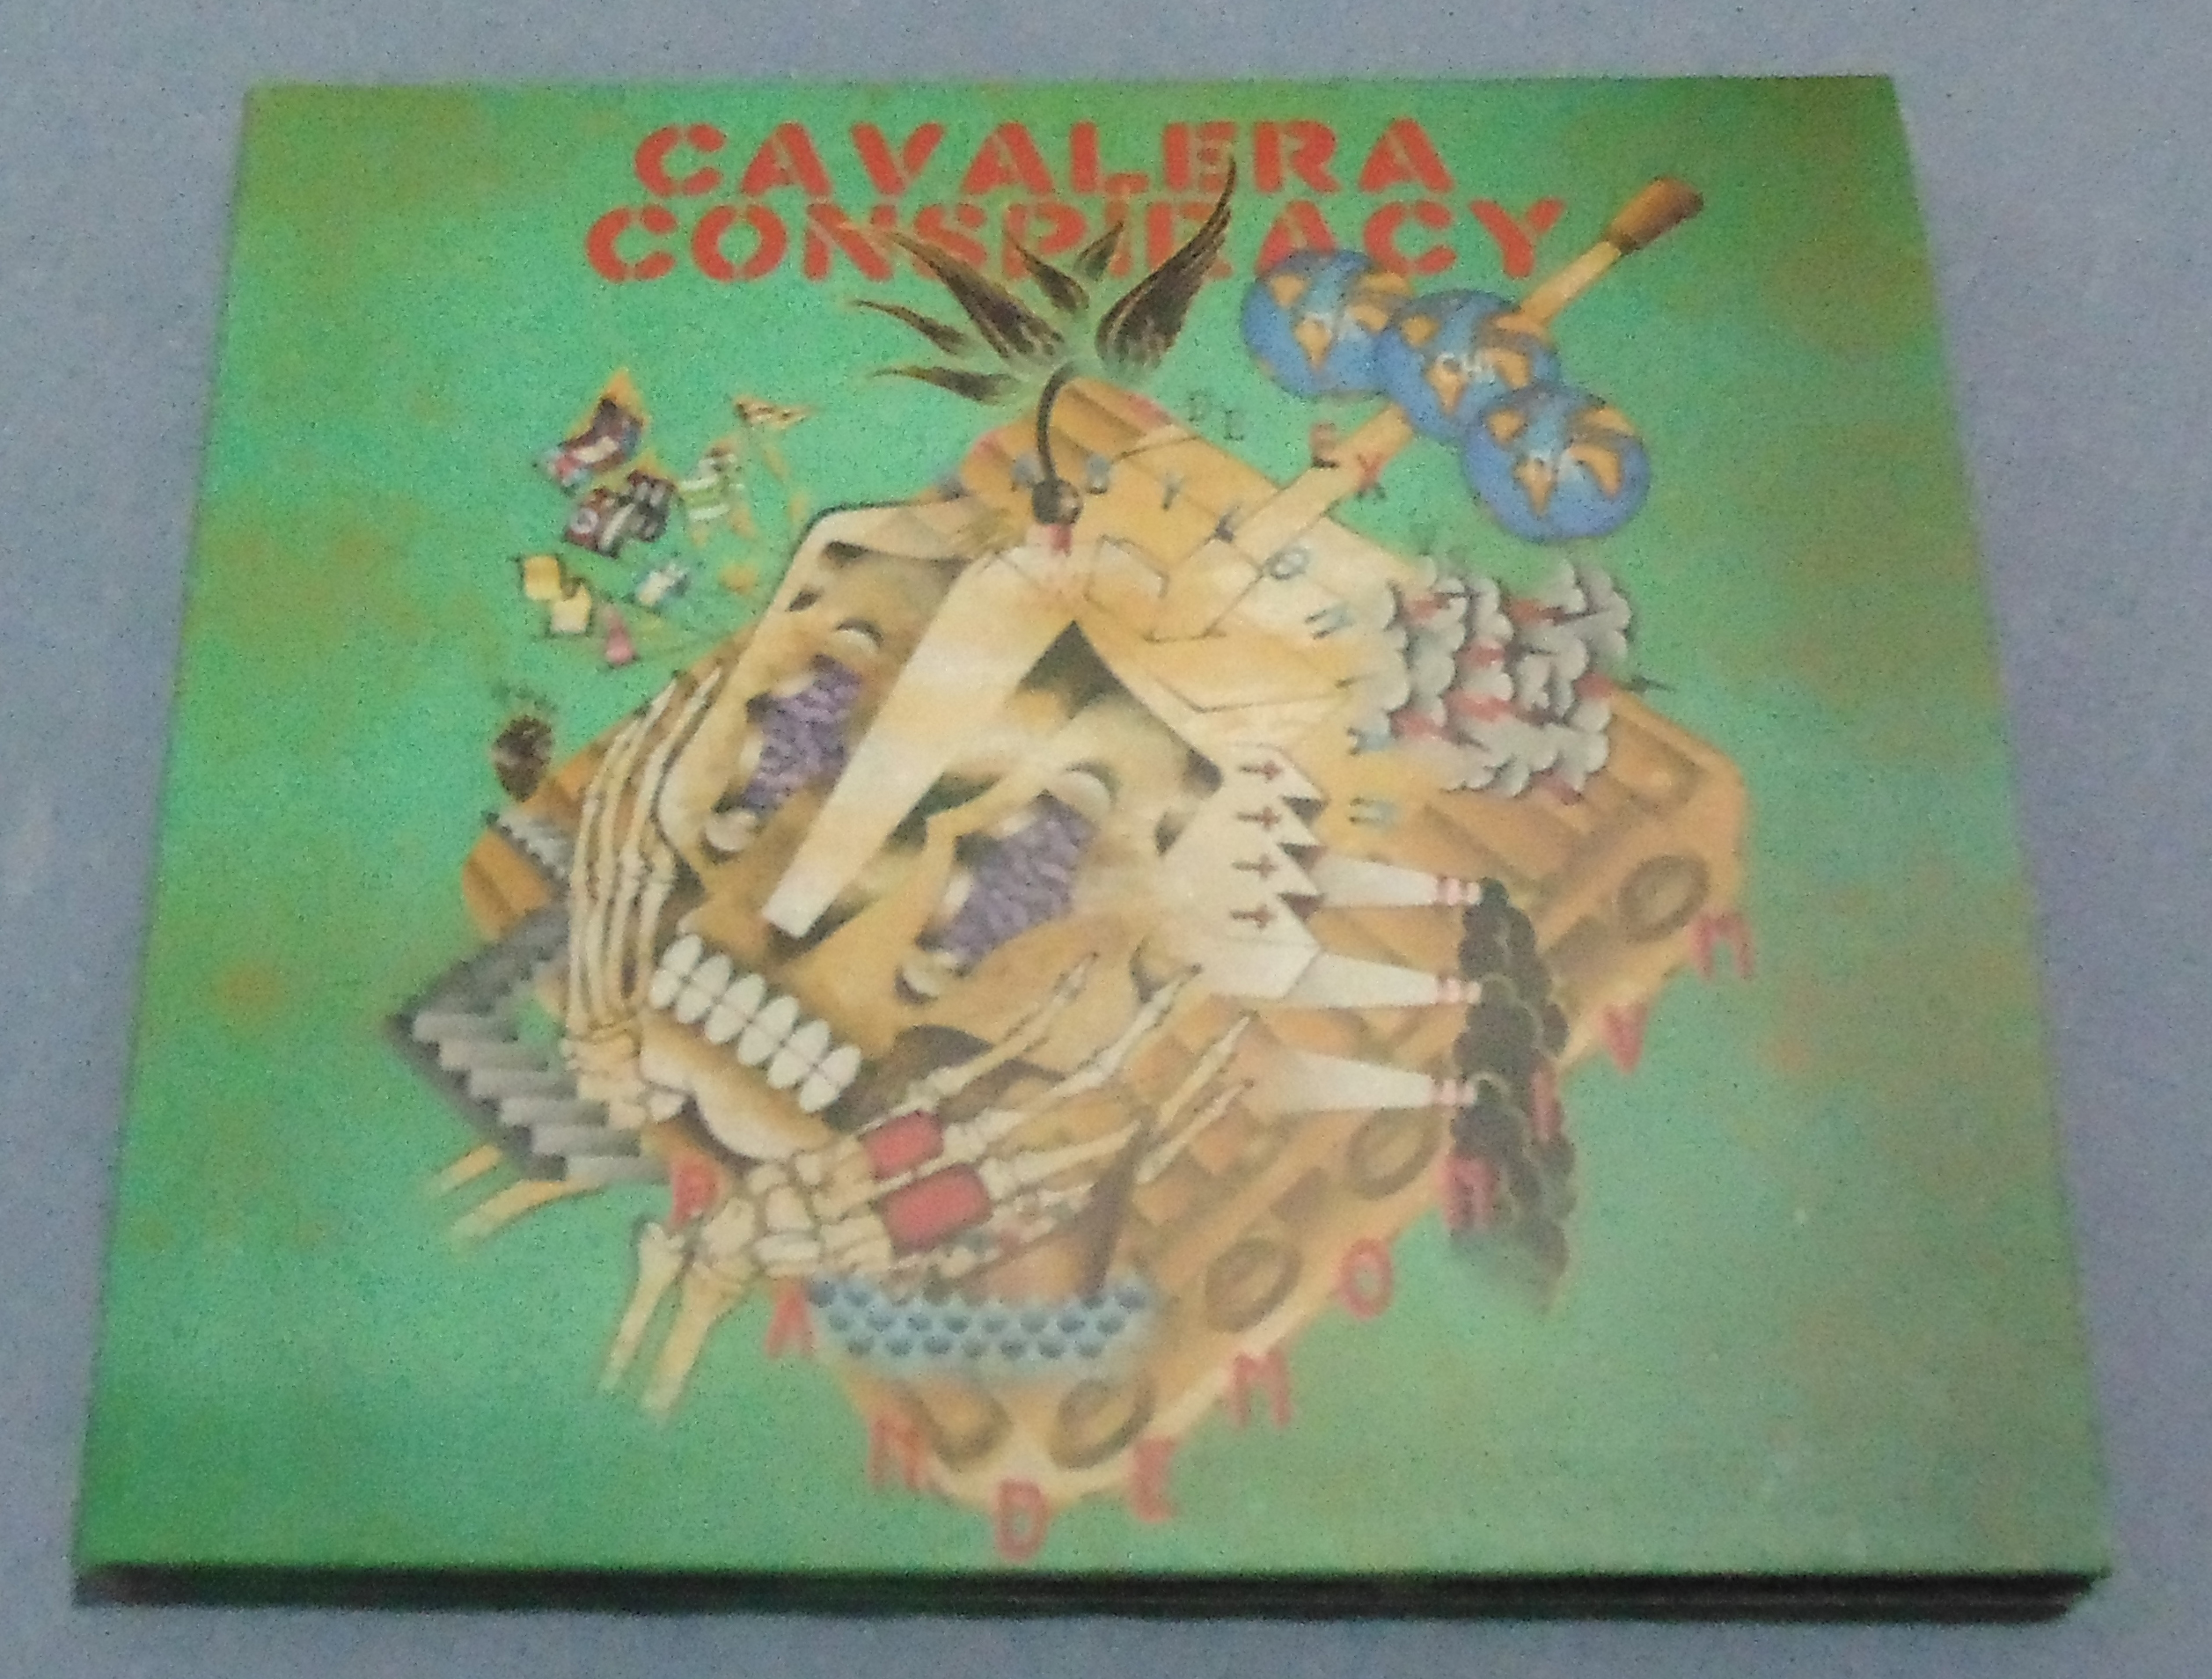 Cavalero Conspiracy.jpg